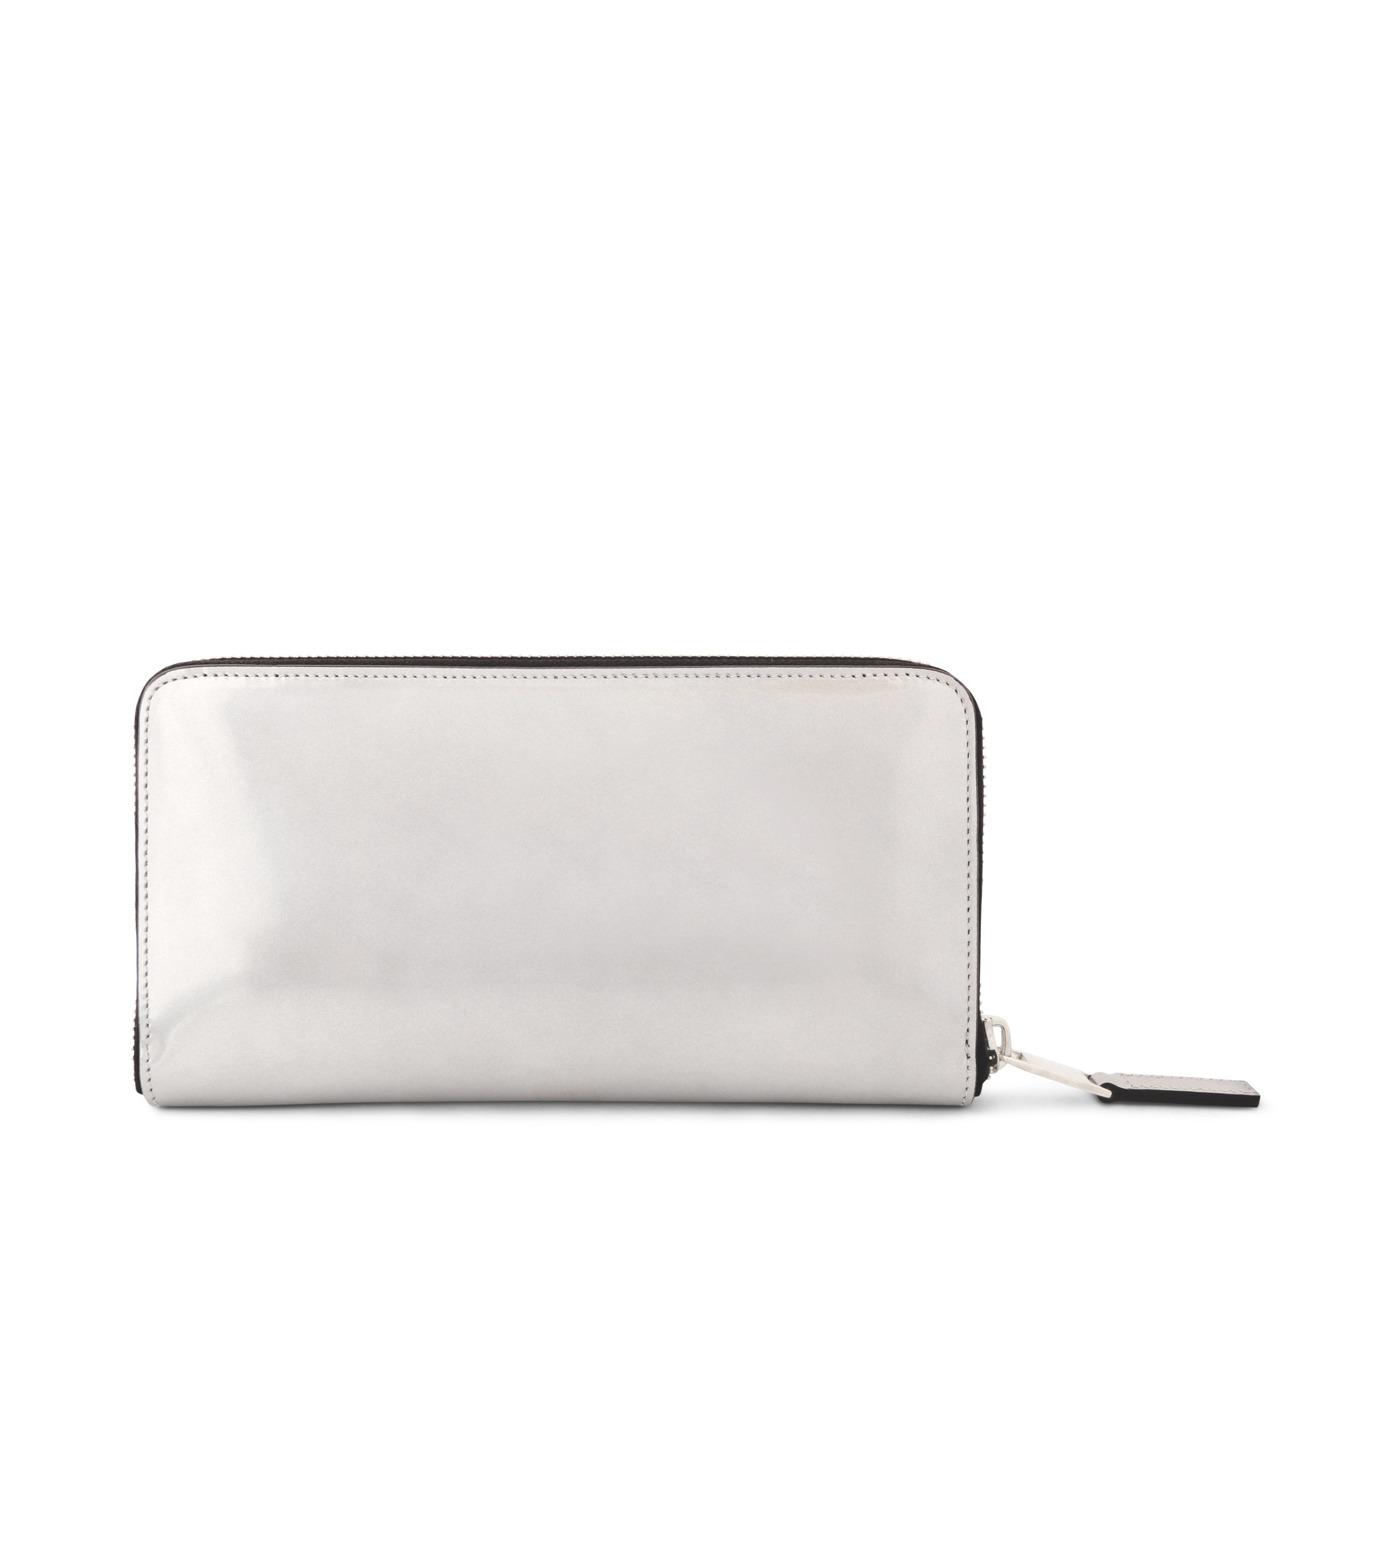 Dior Homme(ディオール オム)のSilver Wallet-SILVER-2DEBC011XJD-1 拡大詳細画像3